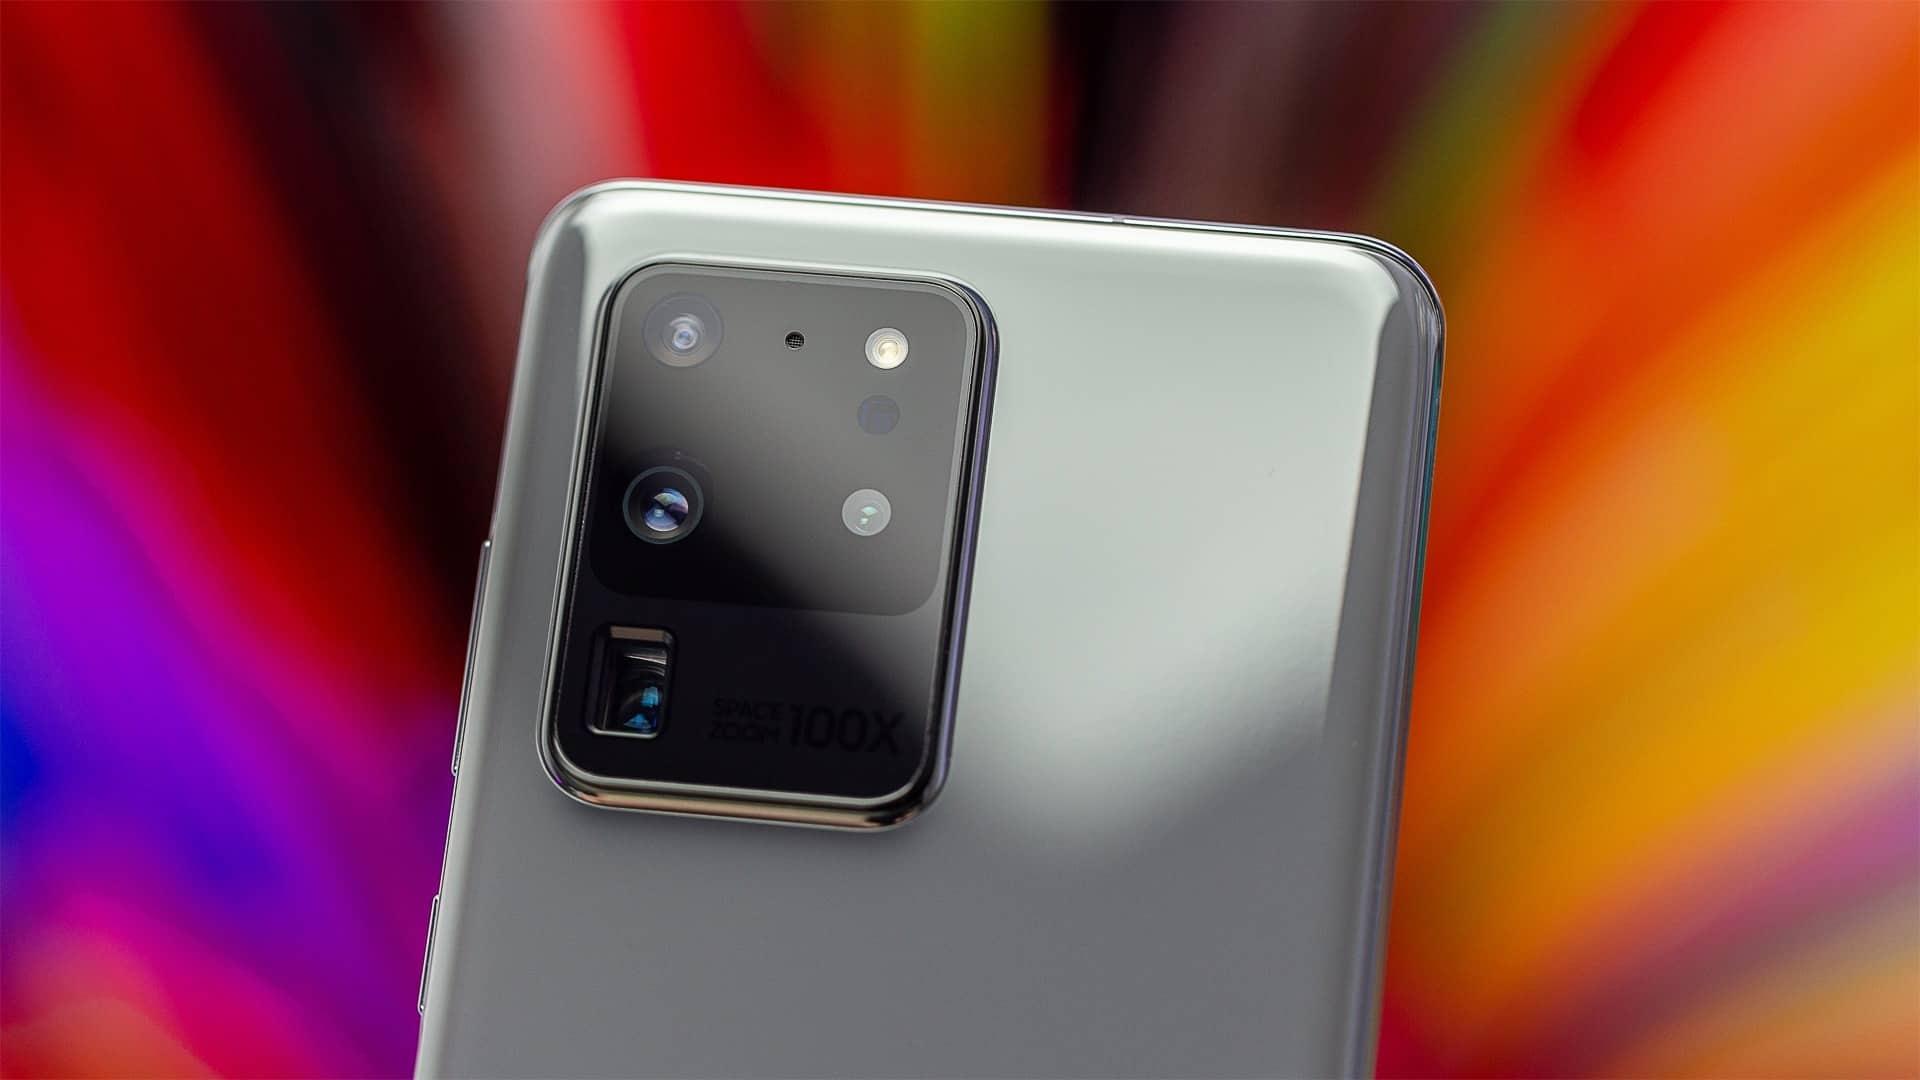 smartfon samsung galaxy s20 ultra problemy